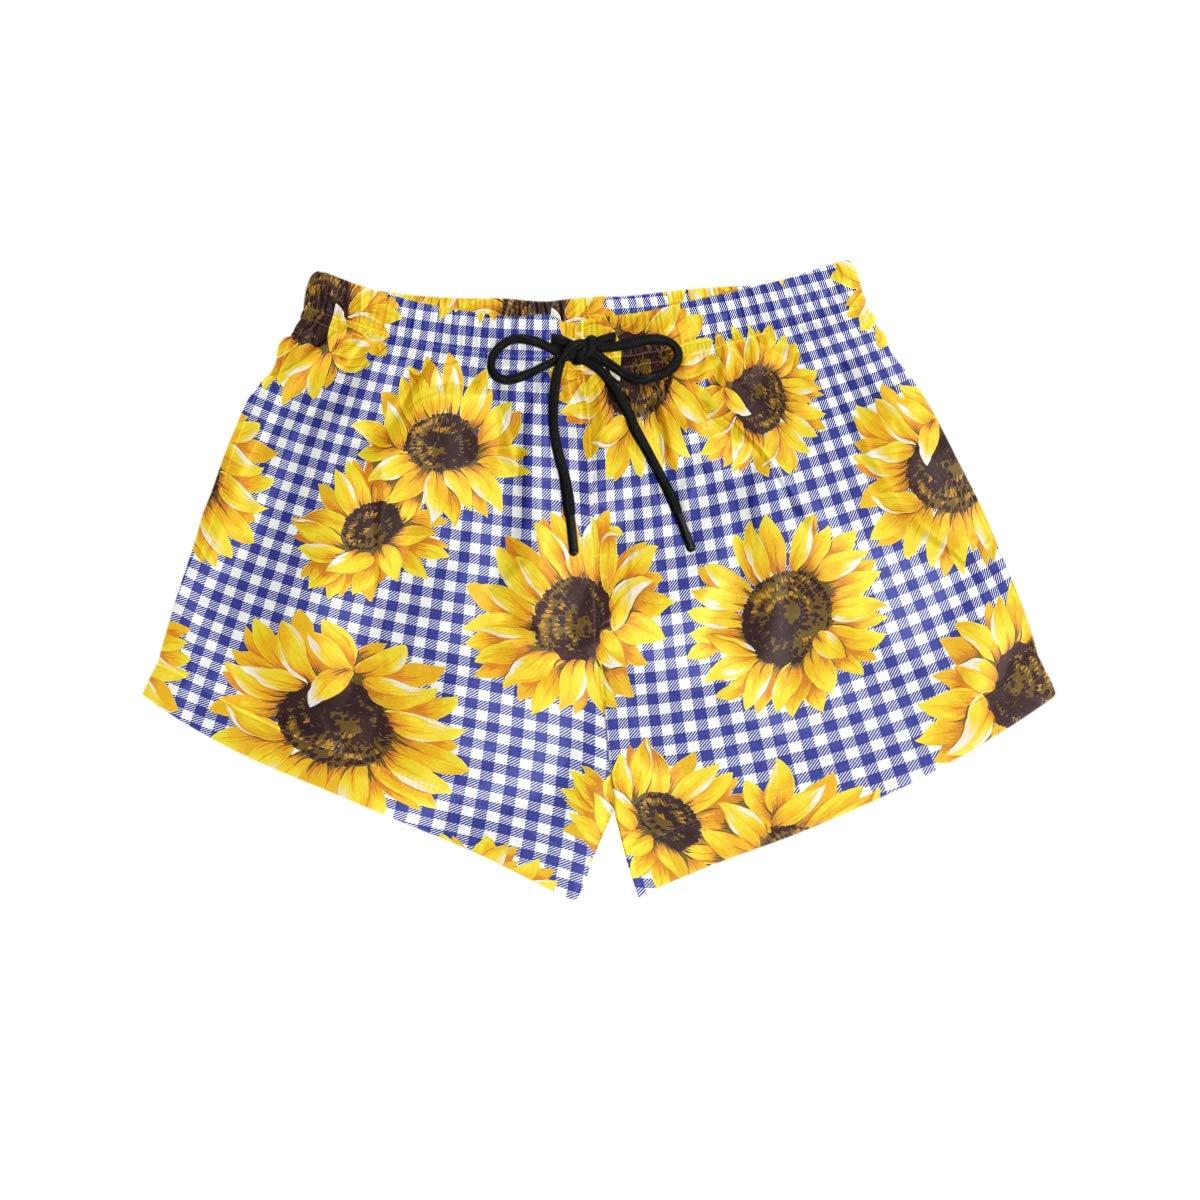 Seamless Sunflowers Blue Plaid Pattern Womens Board Shorts with Pockets Quick Dry Drawstring Beach Swim Trunks S L